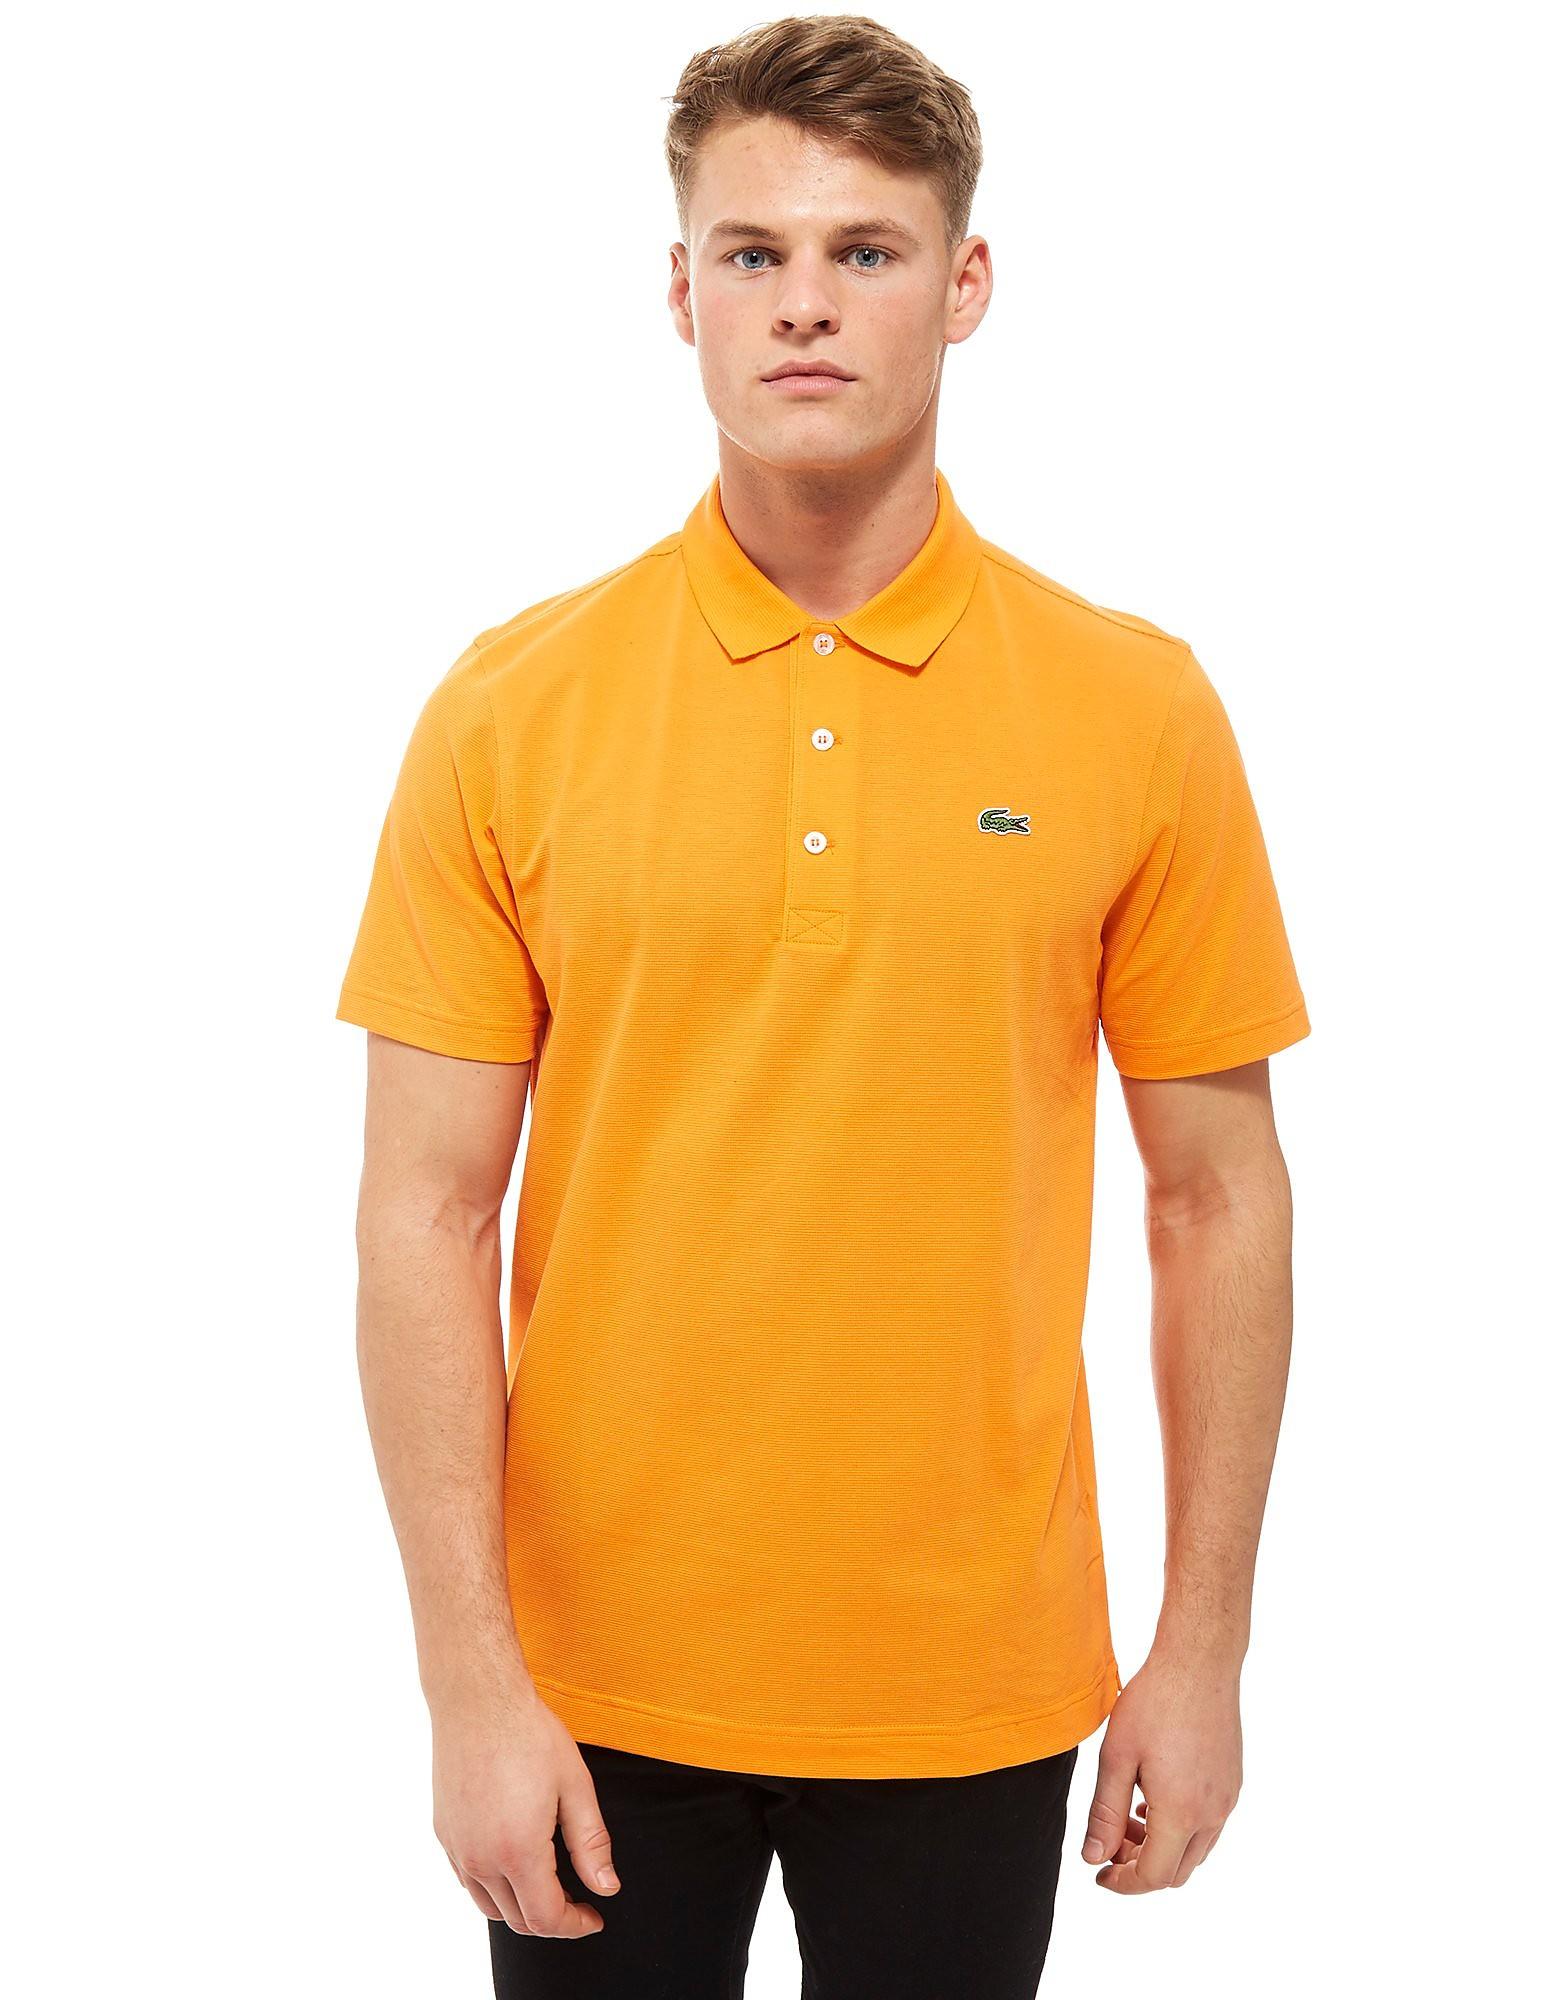 Lacoste Alligator Polo Shirt